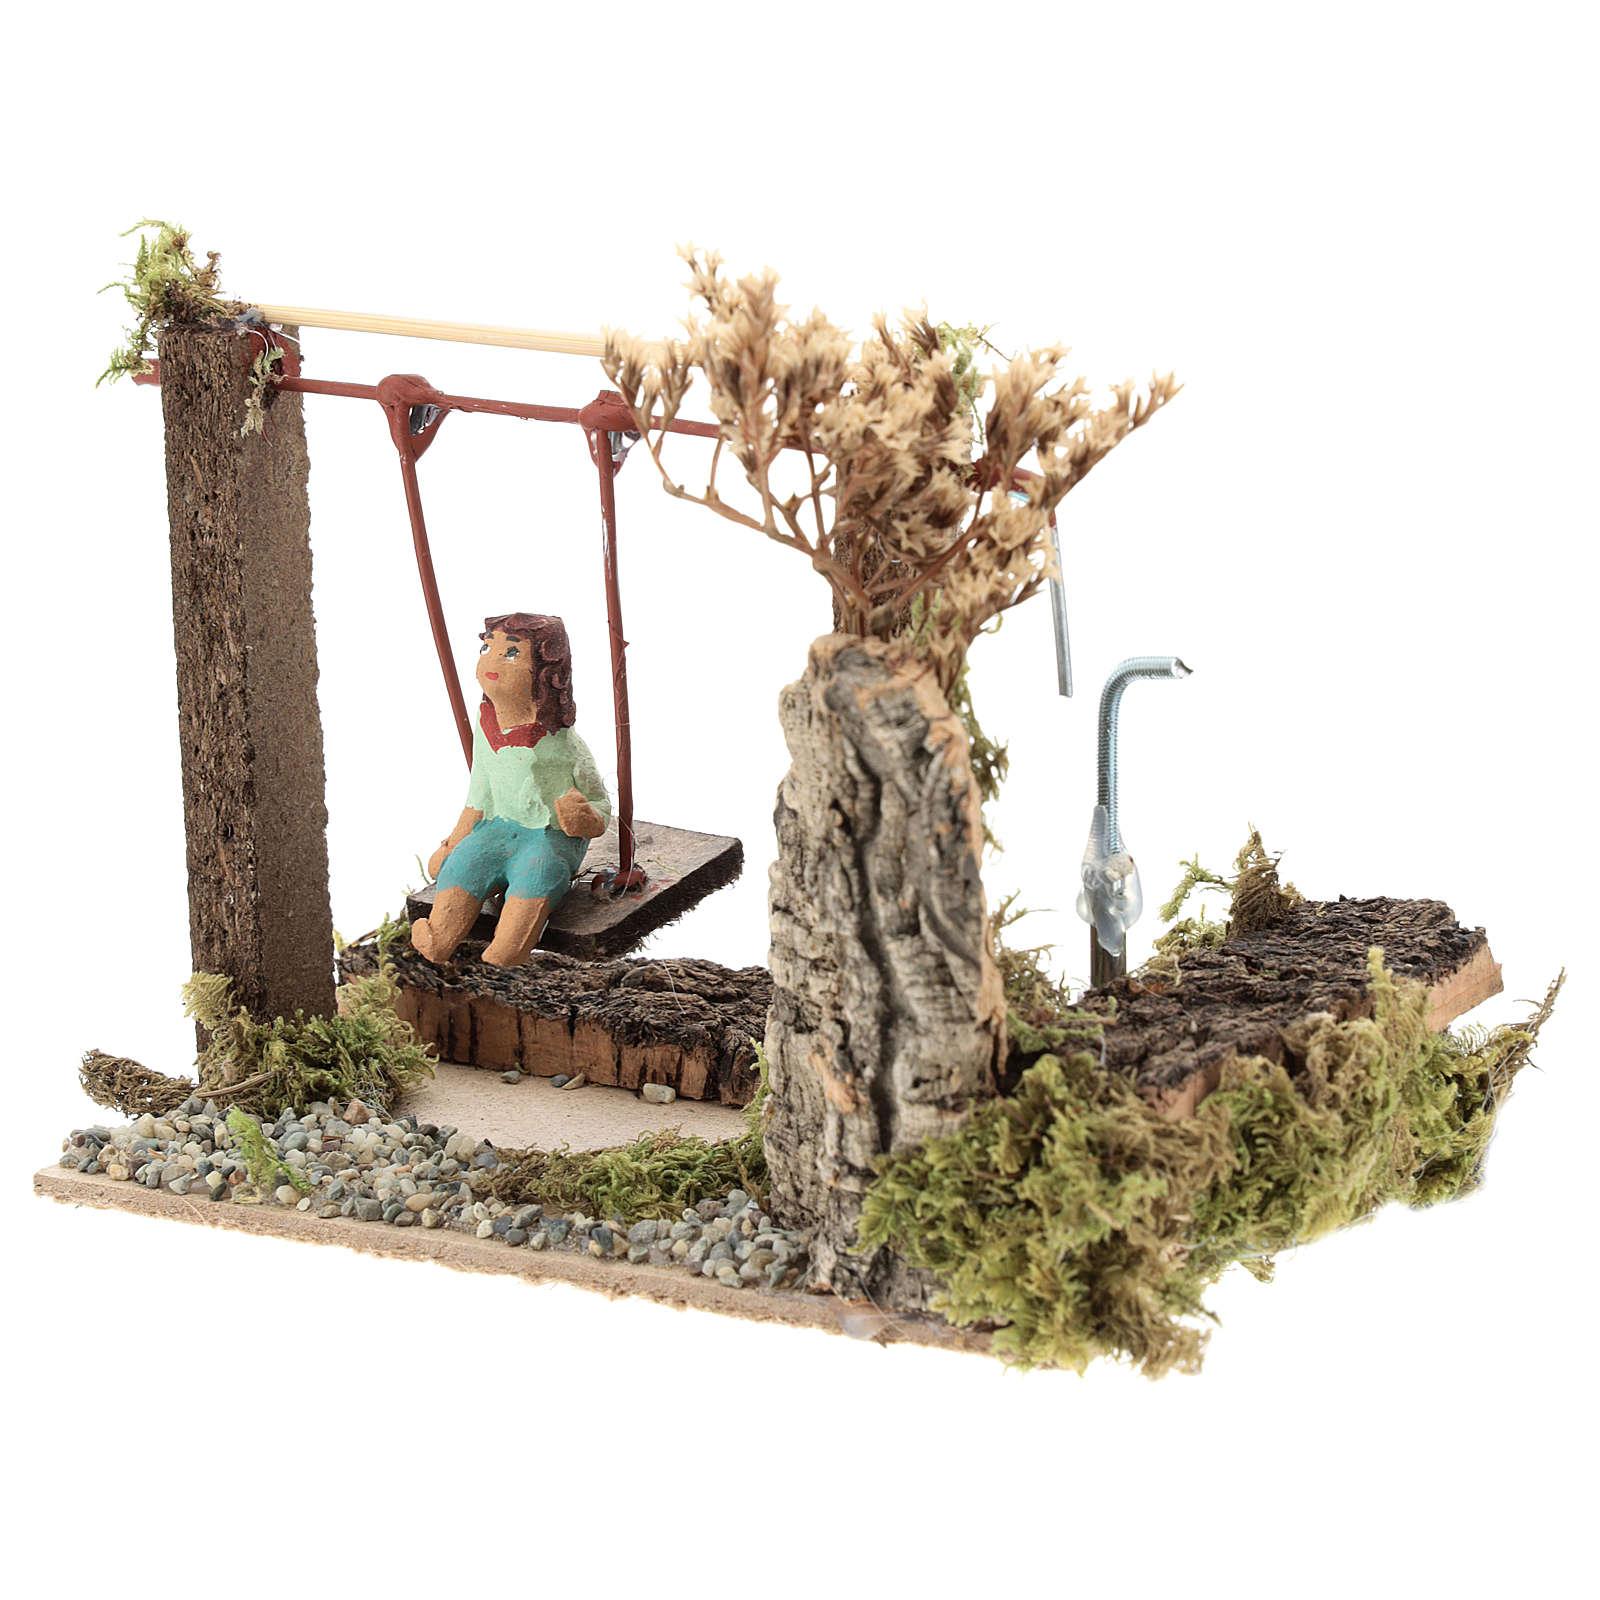 Child on swing, animated nativity figurine 10cm 3